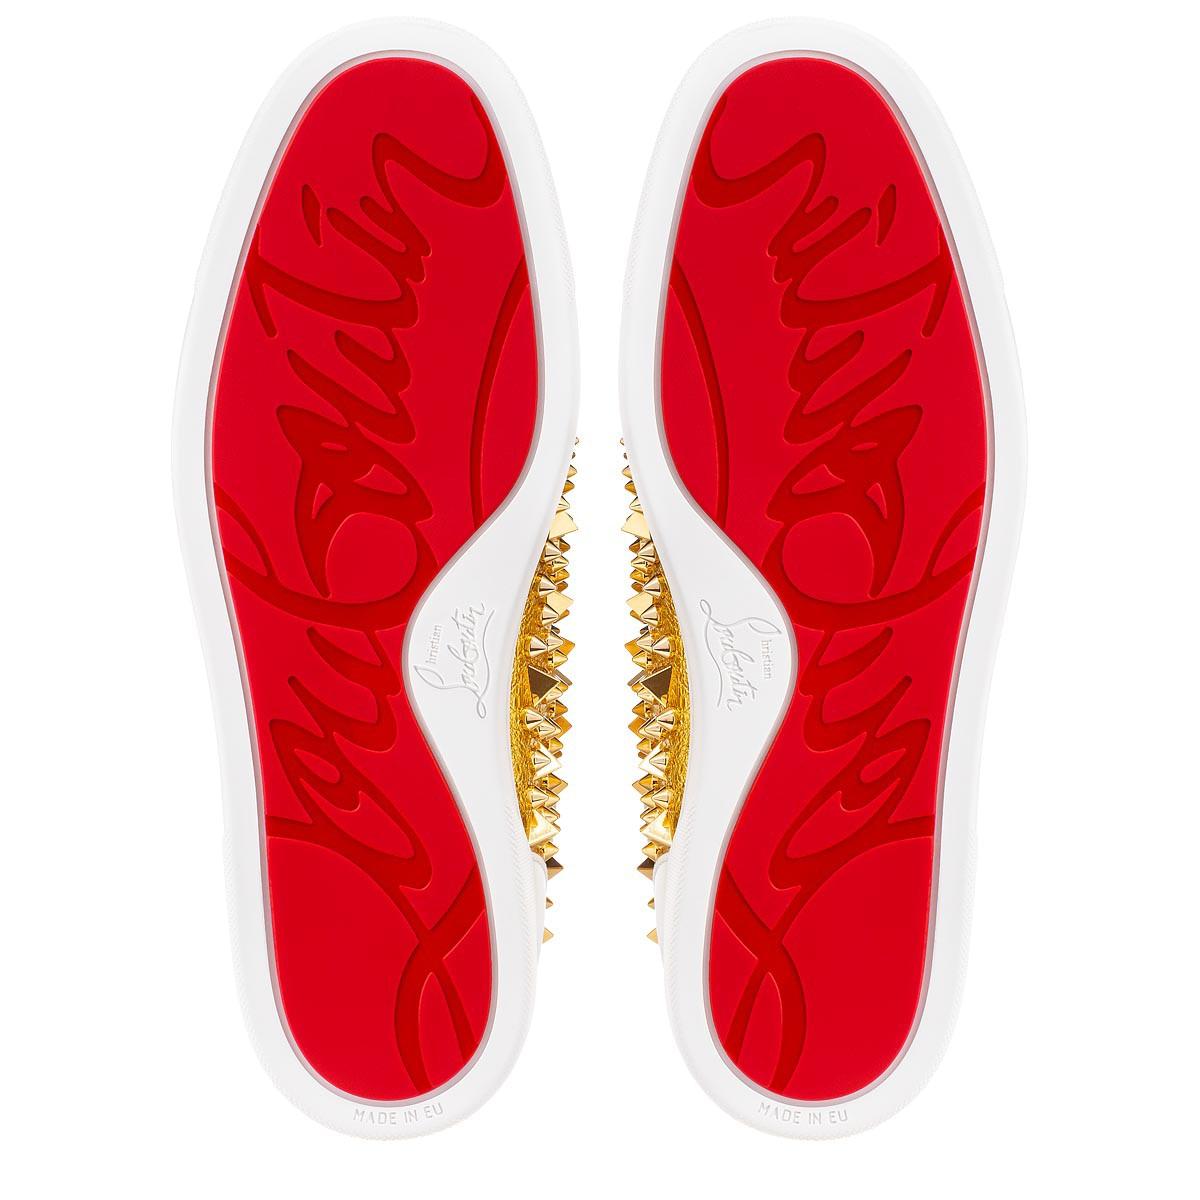 Shoes - No Limit 018 Flat - Christian Louboutin